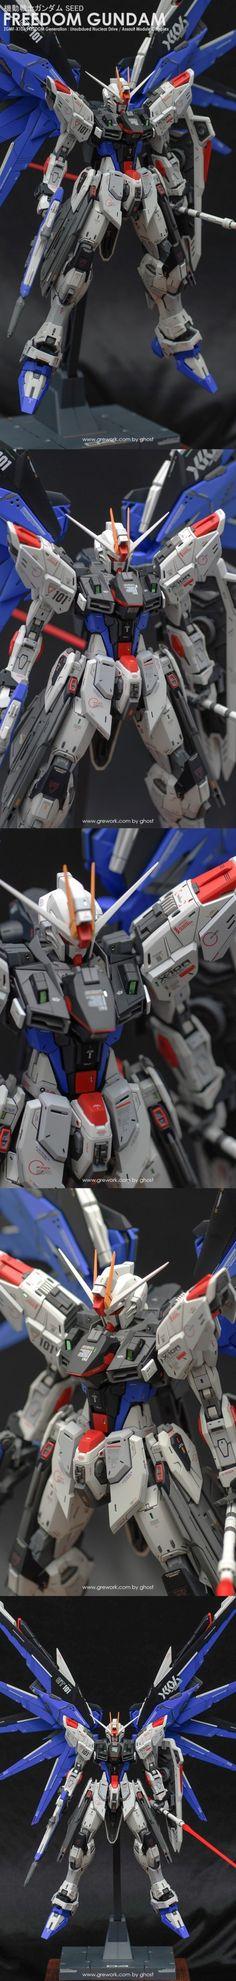 POINTNET.COM.HK - 高手作品 MG 1/100 Freedom Gundam ver 2.0